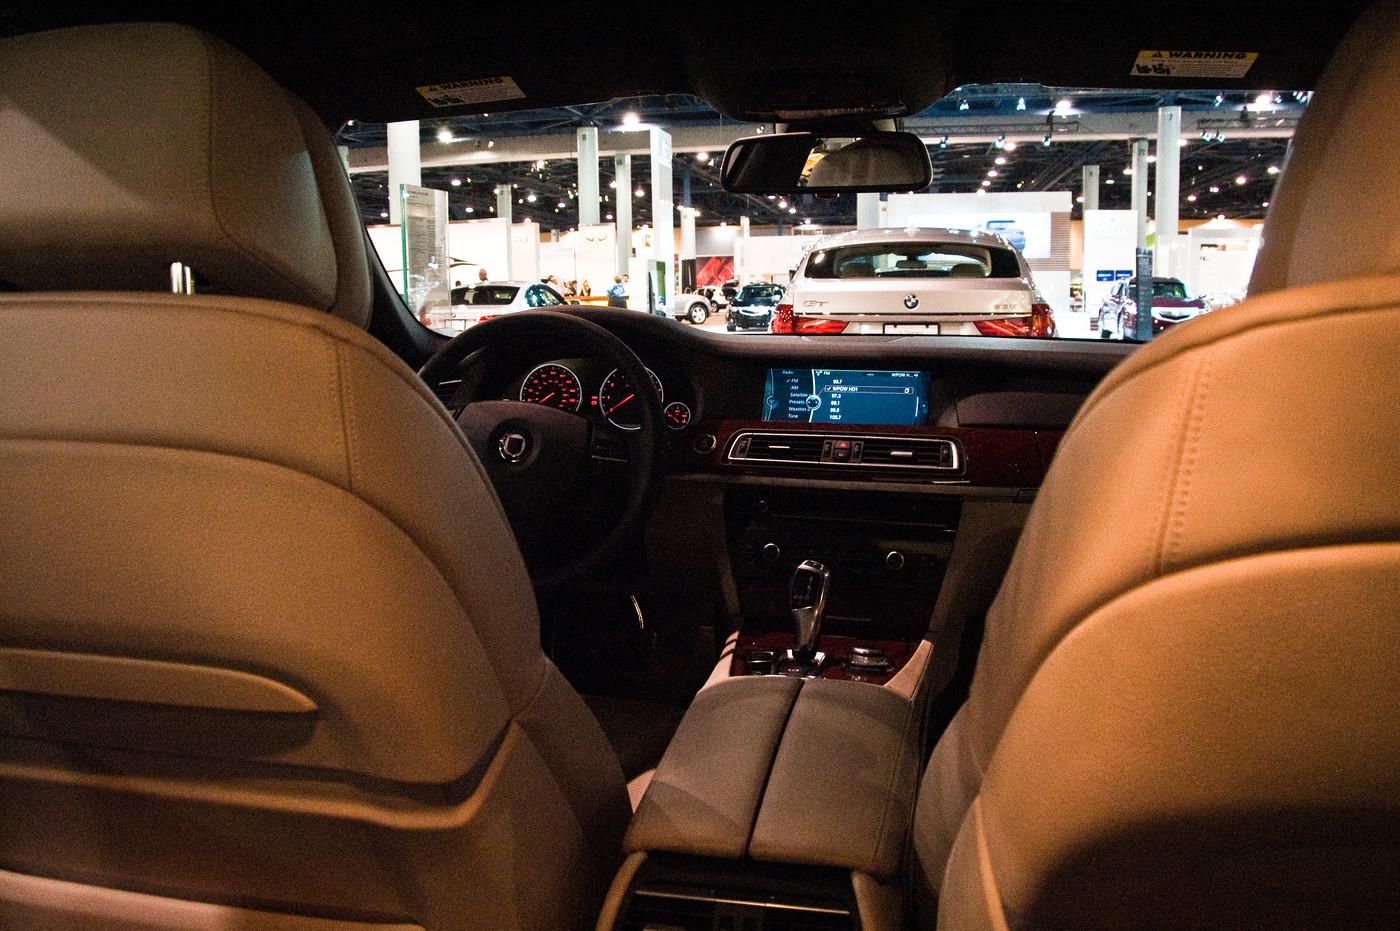 40th anniversary international car show miami beach 2010 (91 of 255)